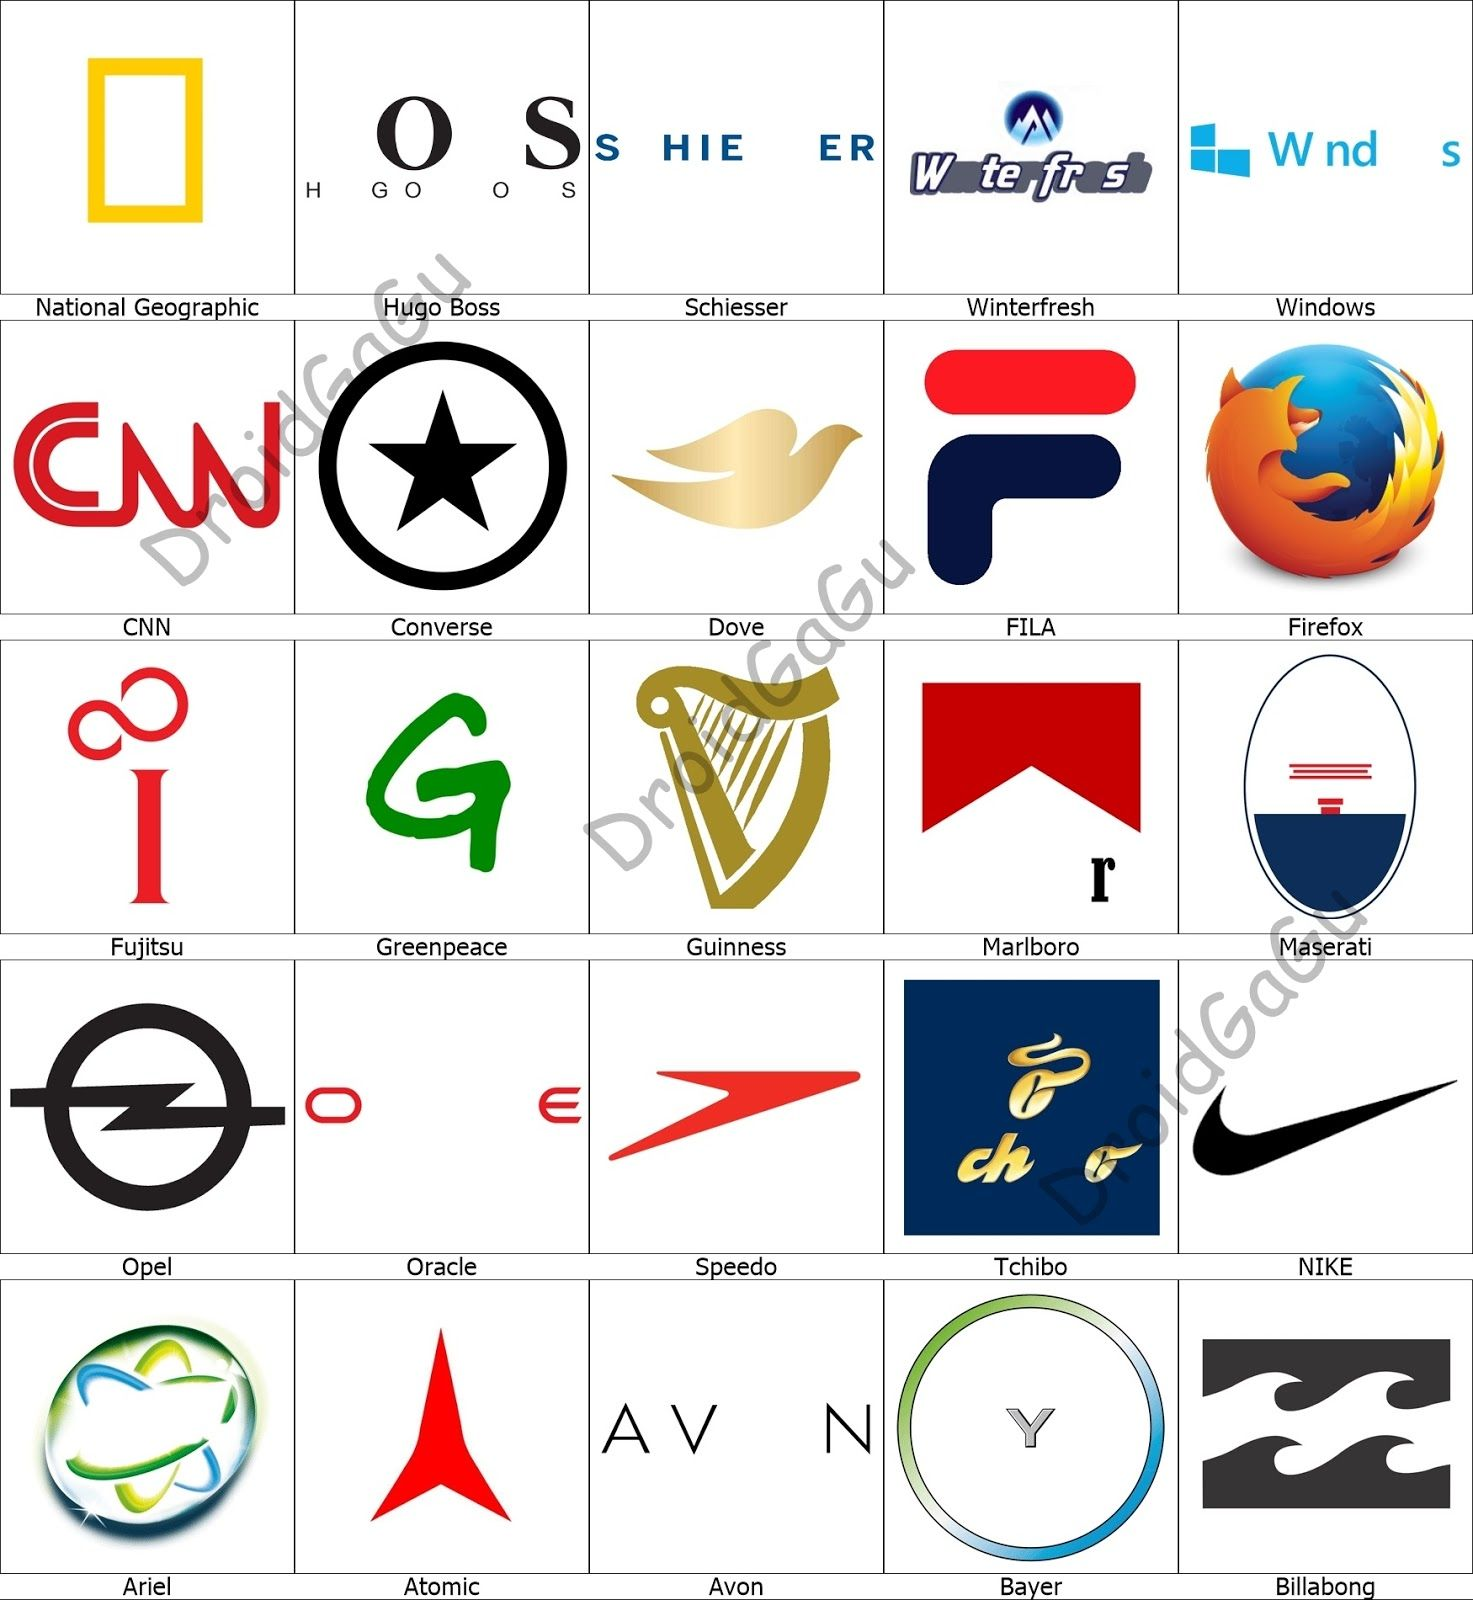 Logo Quiz Level 1 juicy9fj Pinterest Logos and Quizes